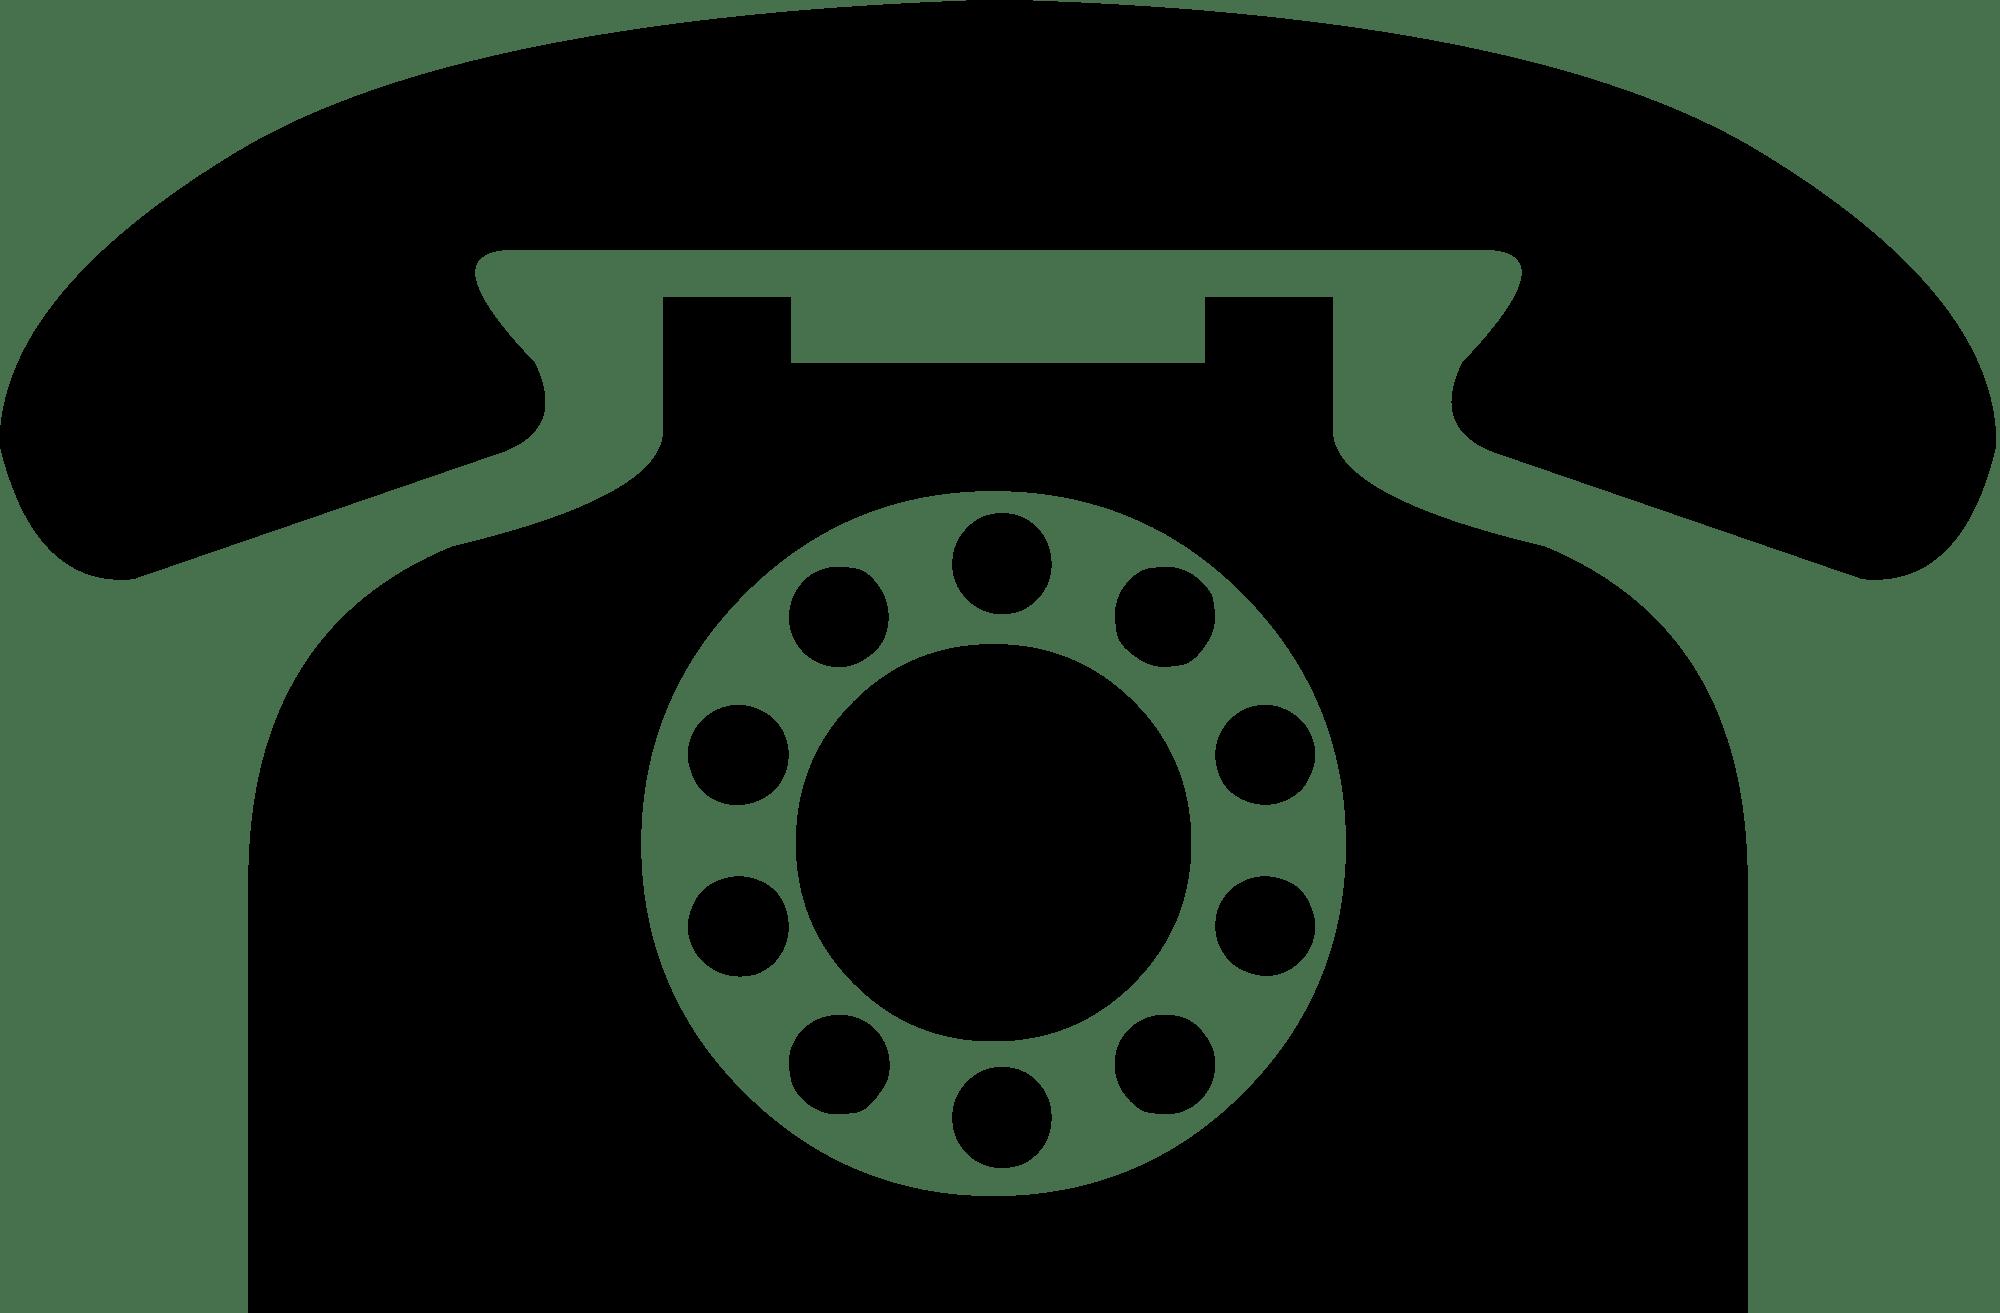 Phone png icon. Vintage black transparent stickpng